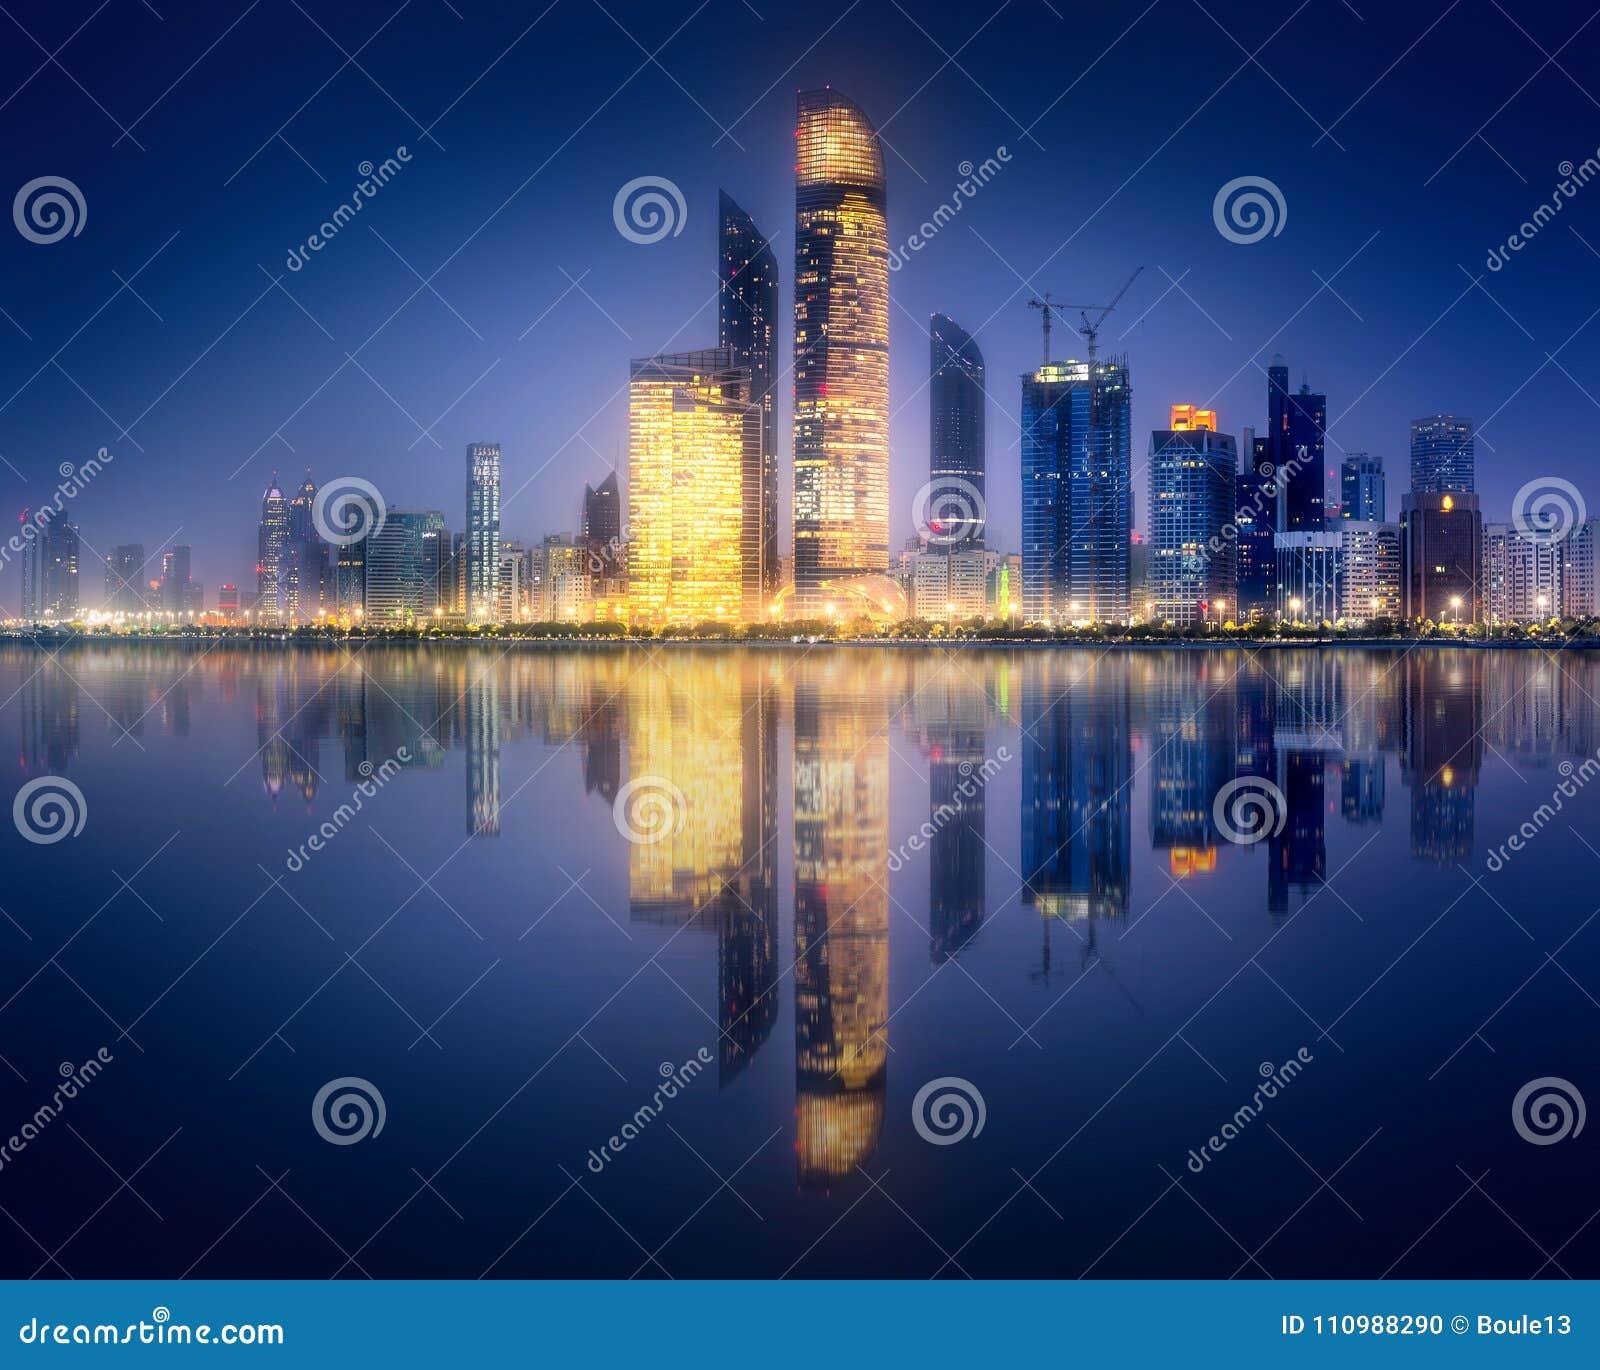 Panorama view of Abu Dhabi Skyline at sunset, UAE